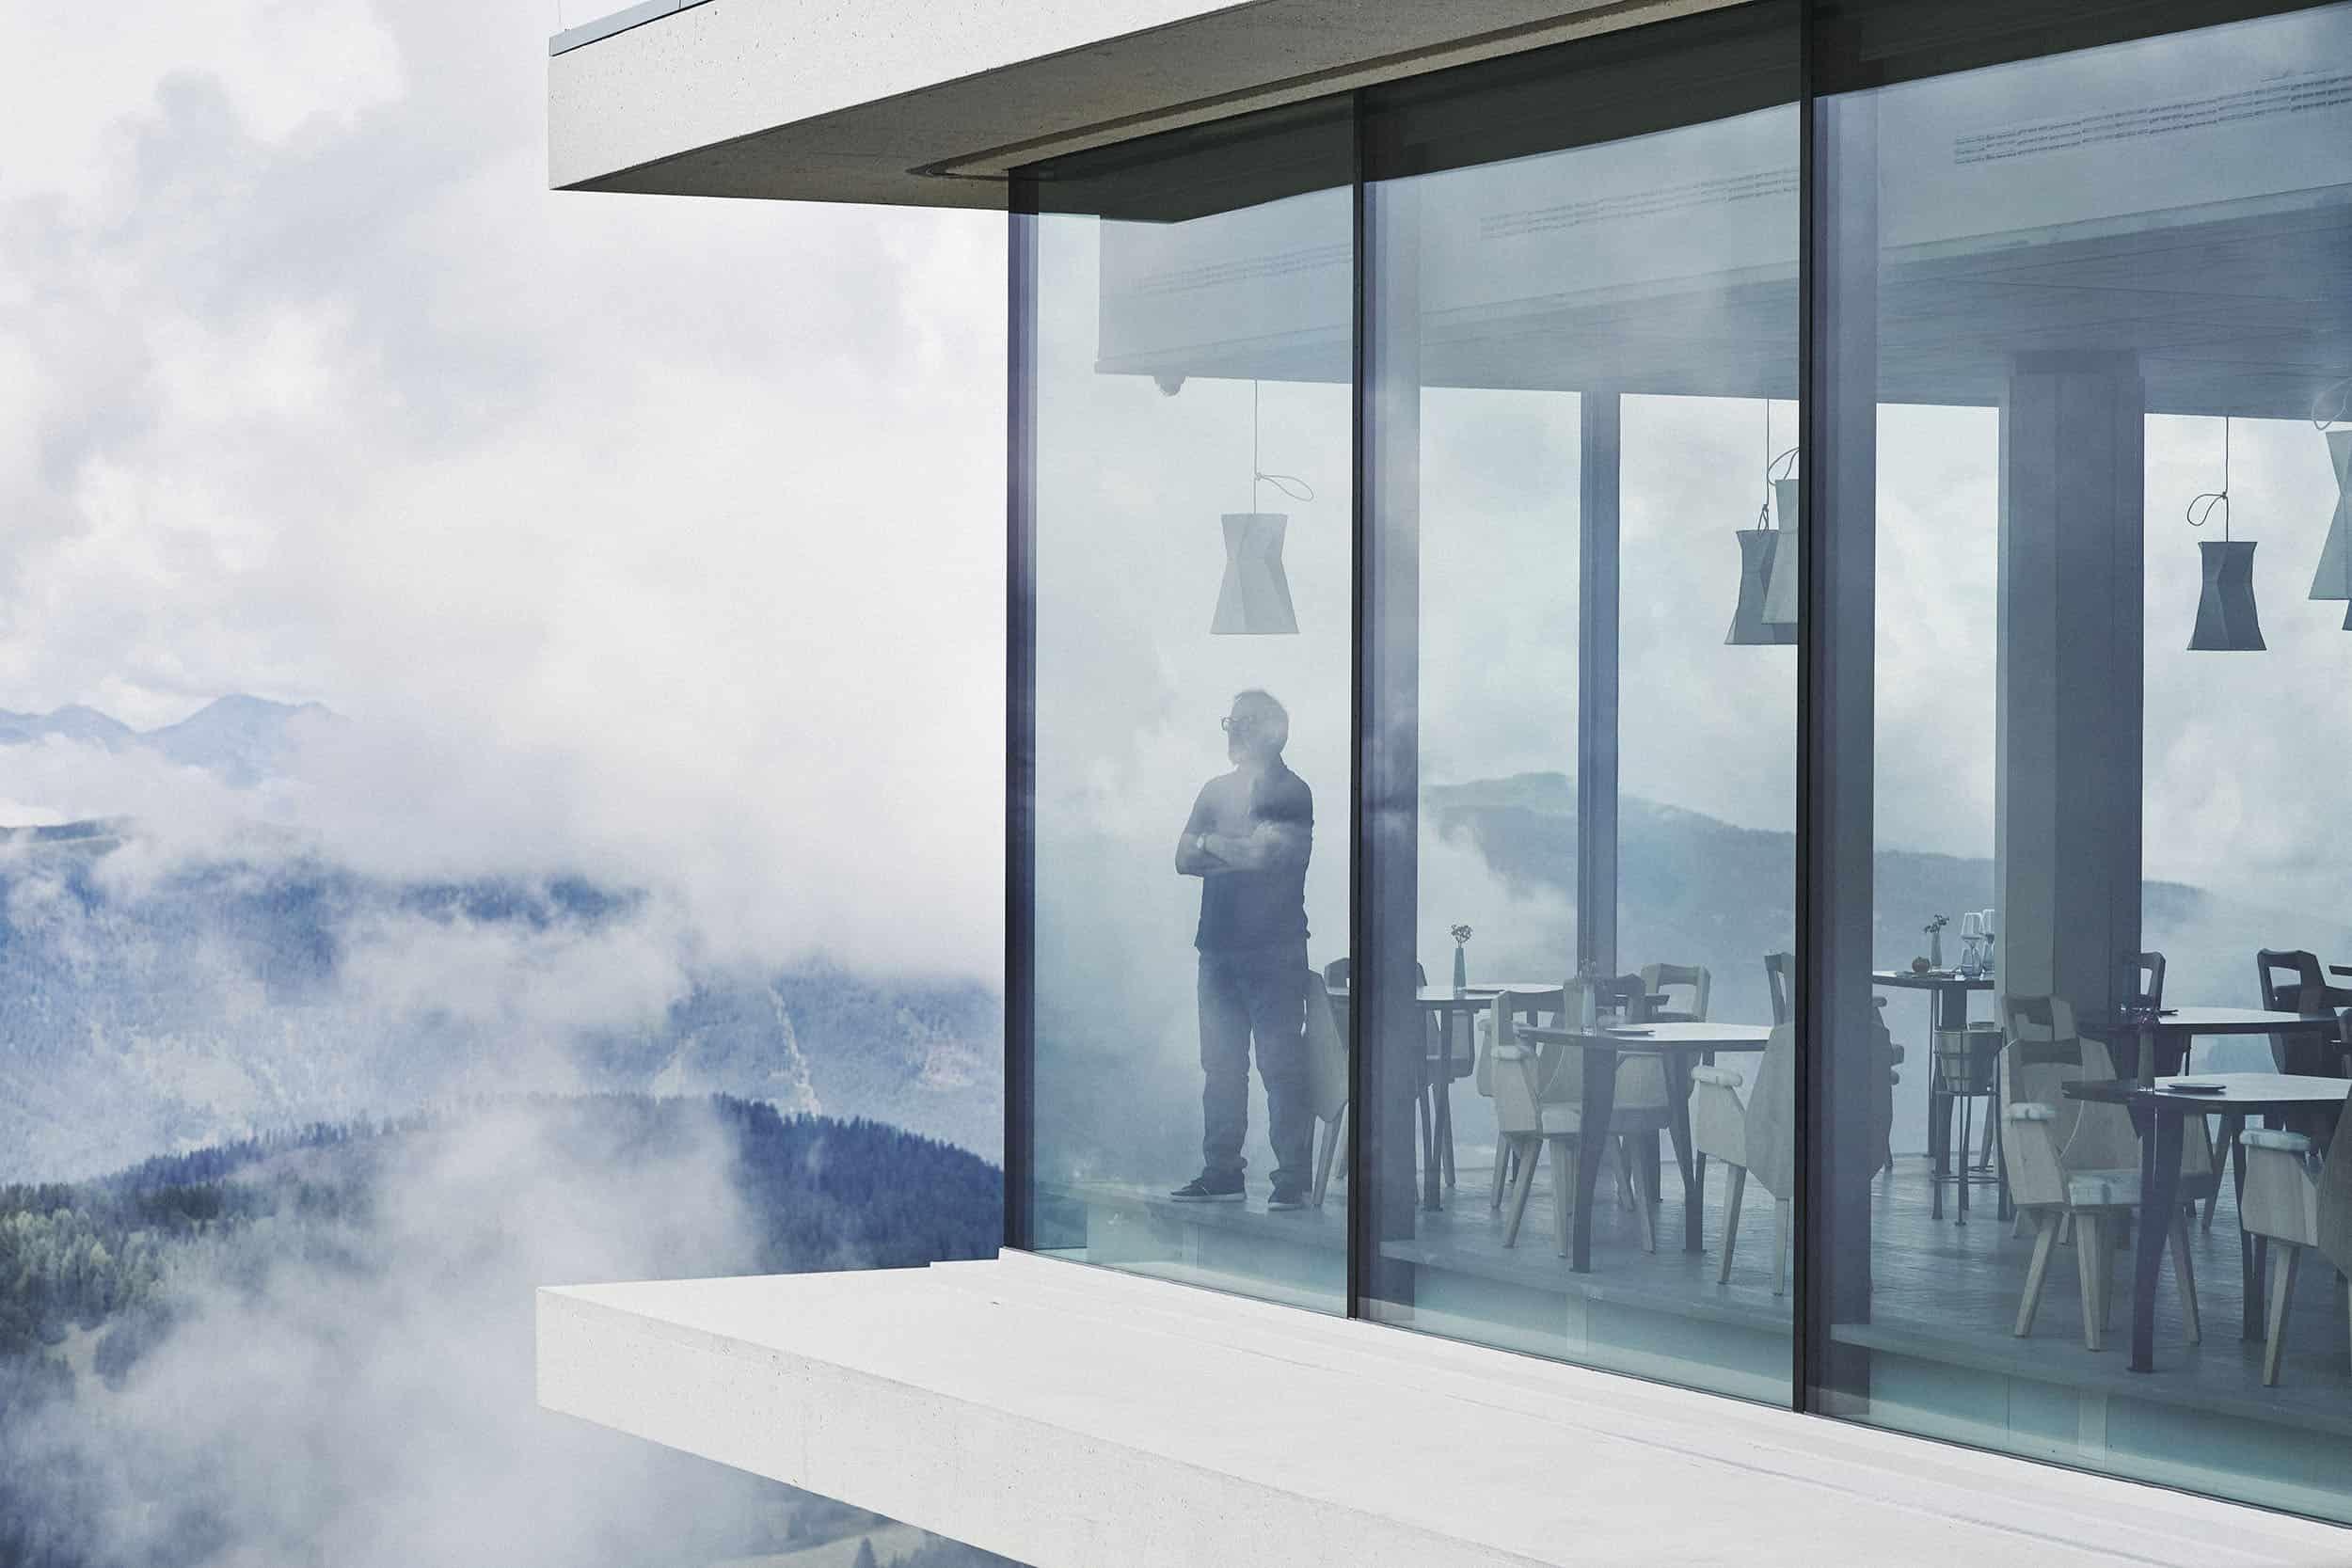 studio-ignatov-norbert-niederkofler-alpinn-imagekampagne-02